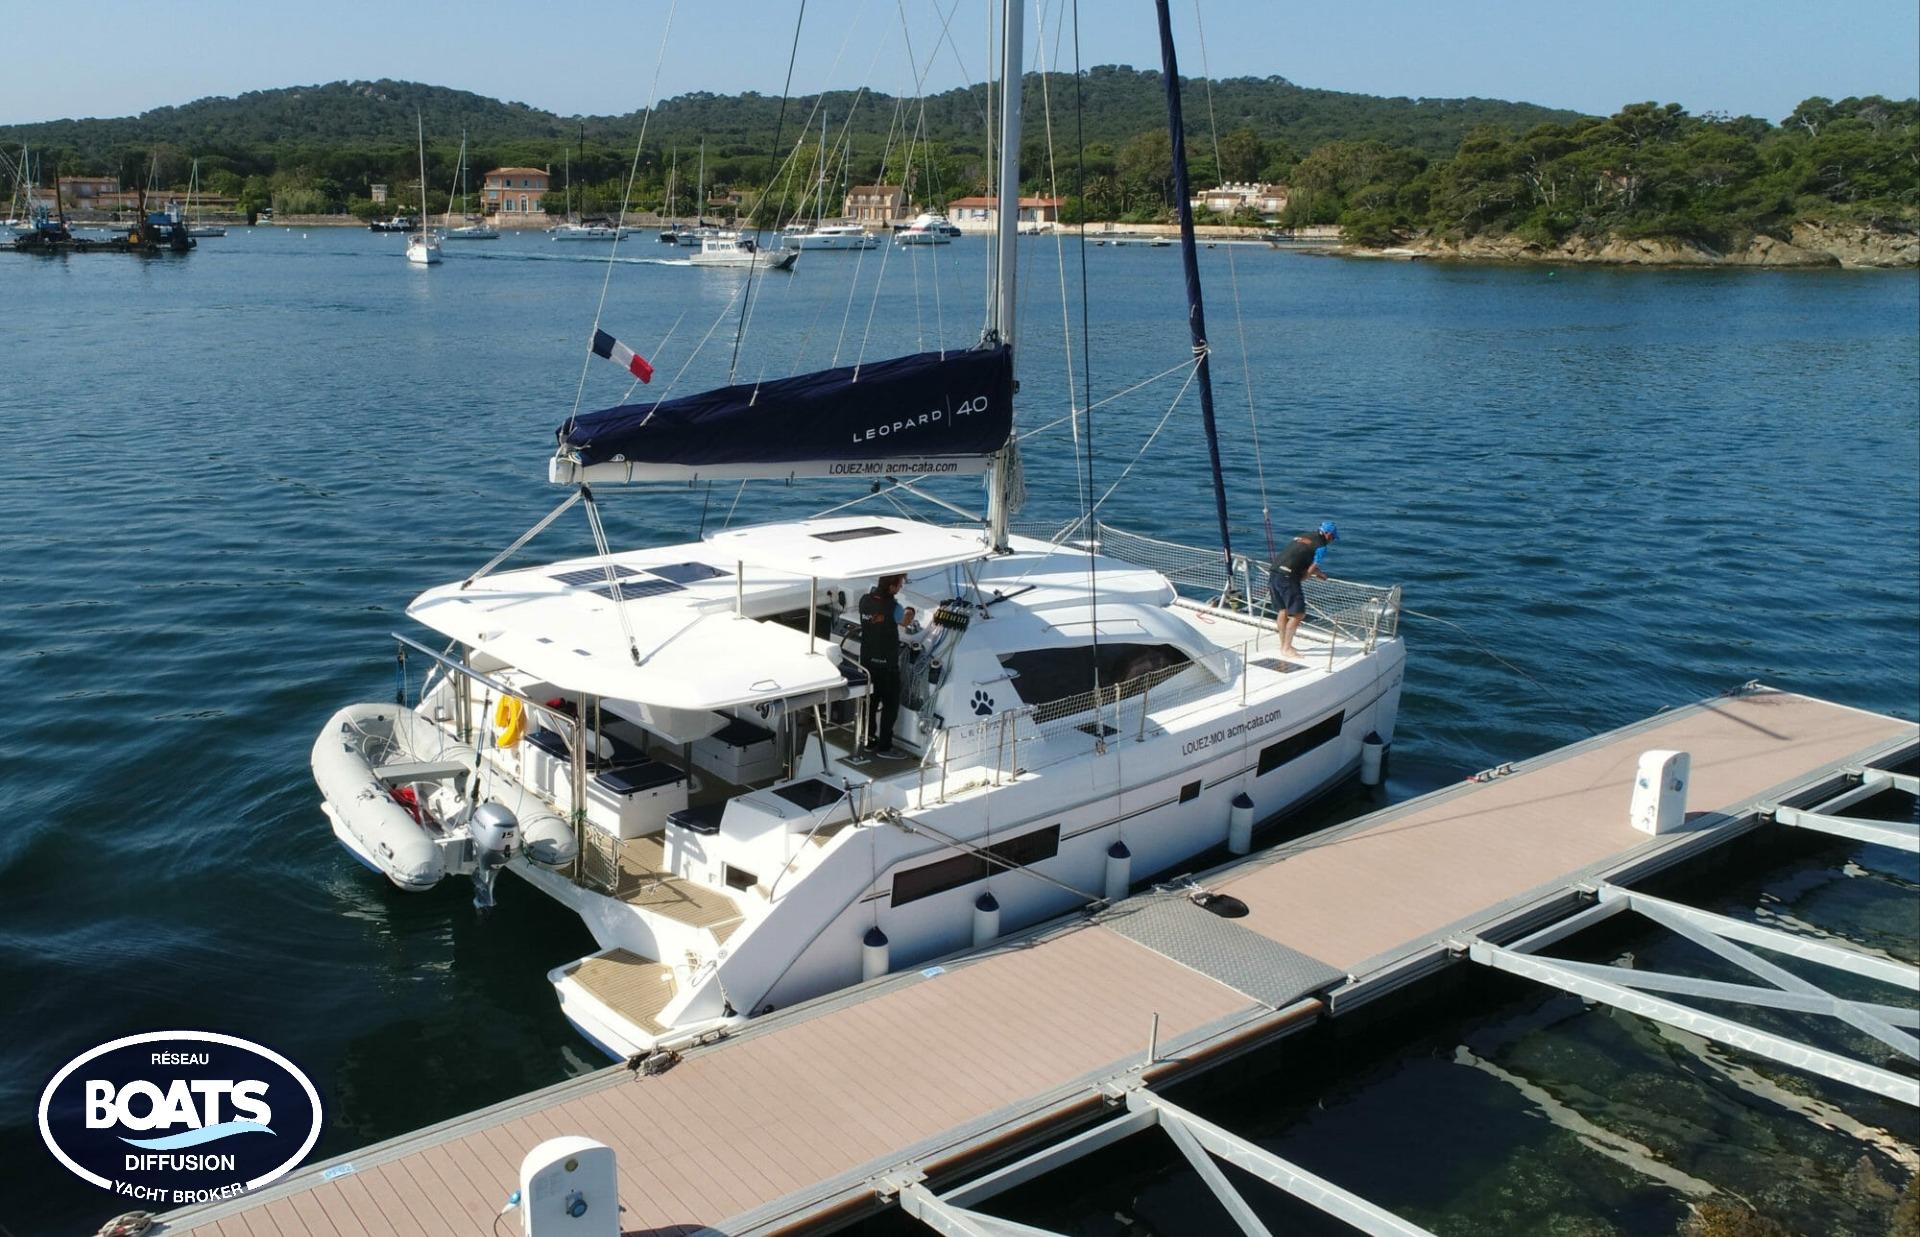 Catamaran Leopard LEOPARD 40